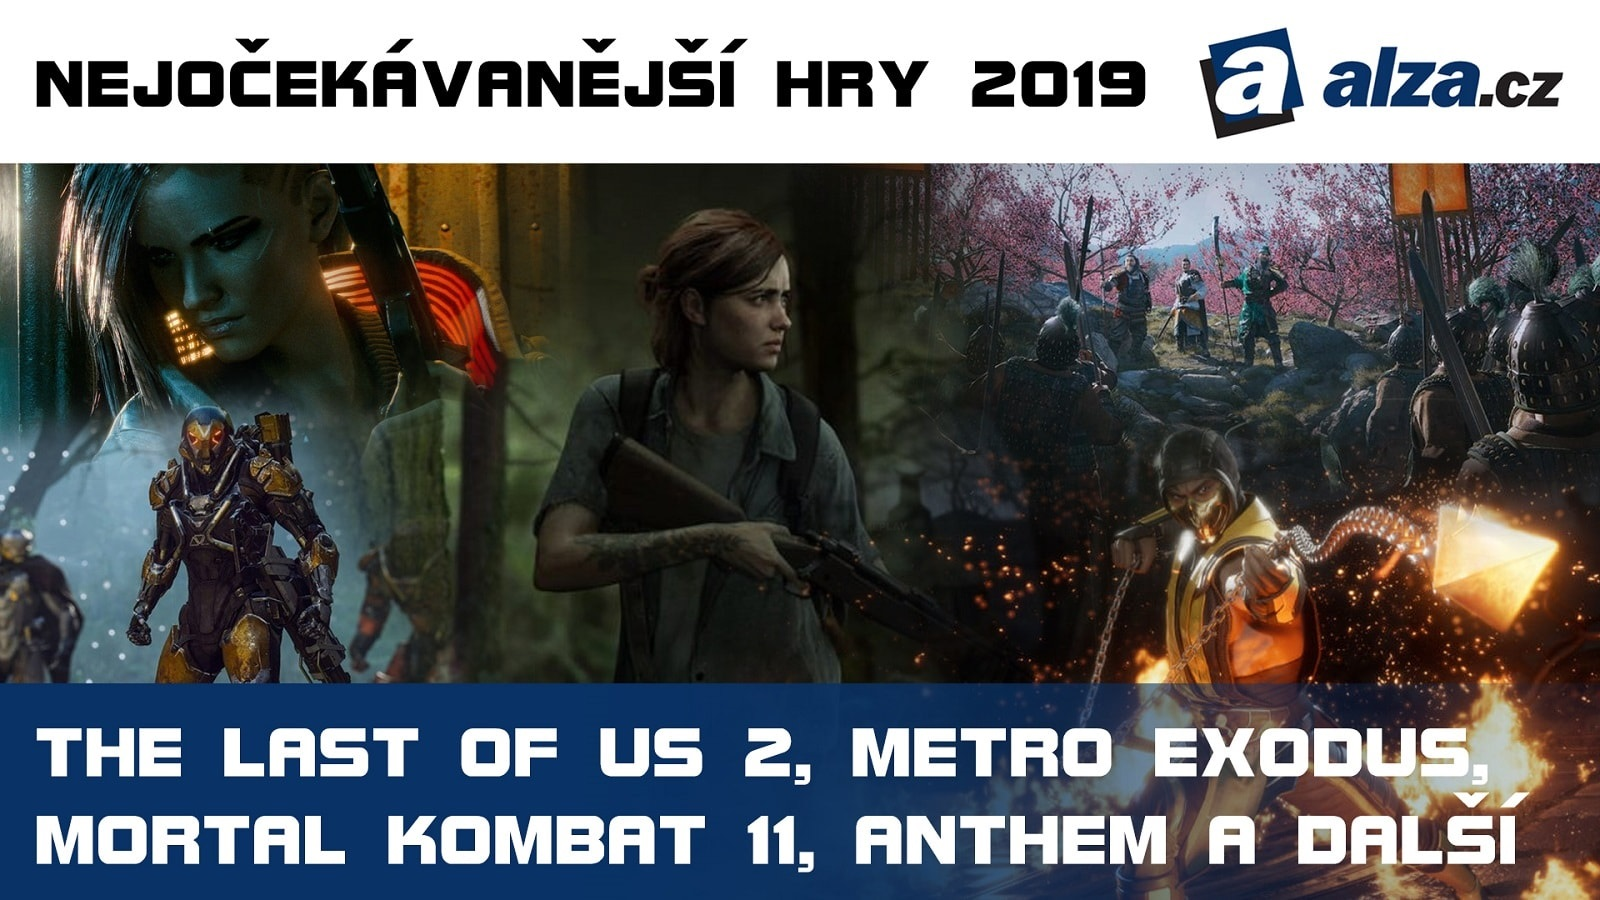 Nejočekávanější hry roku 2019: Cyberpunk 2077, The Last of Us Part 2, Metro Exodus